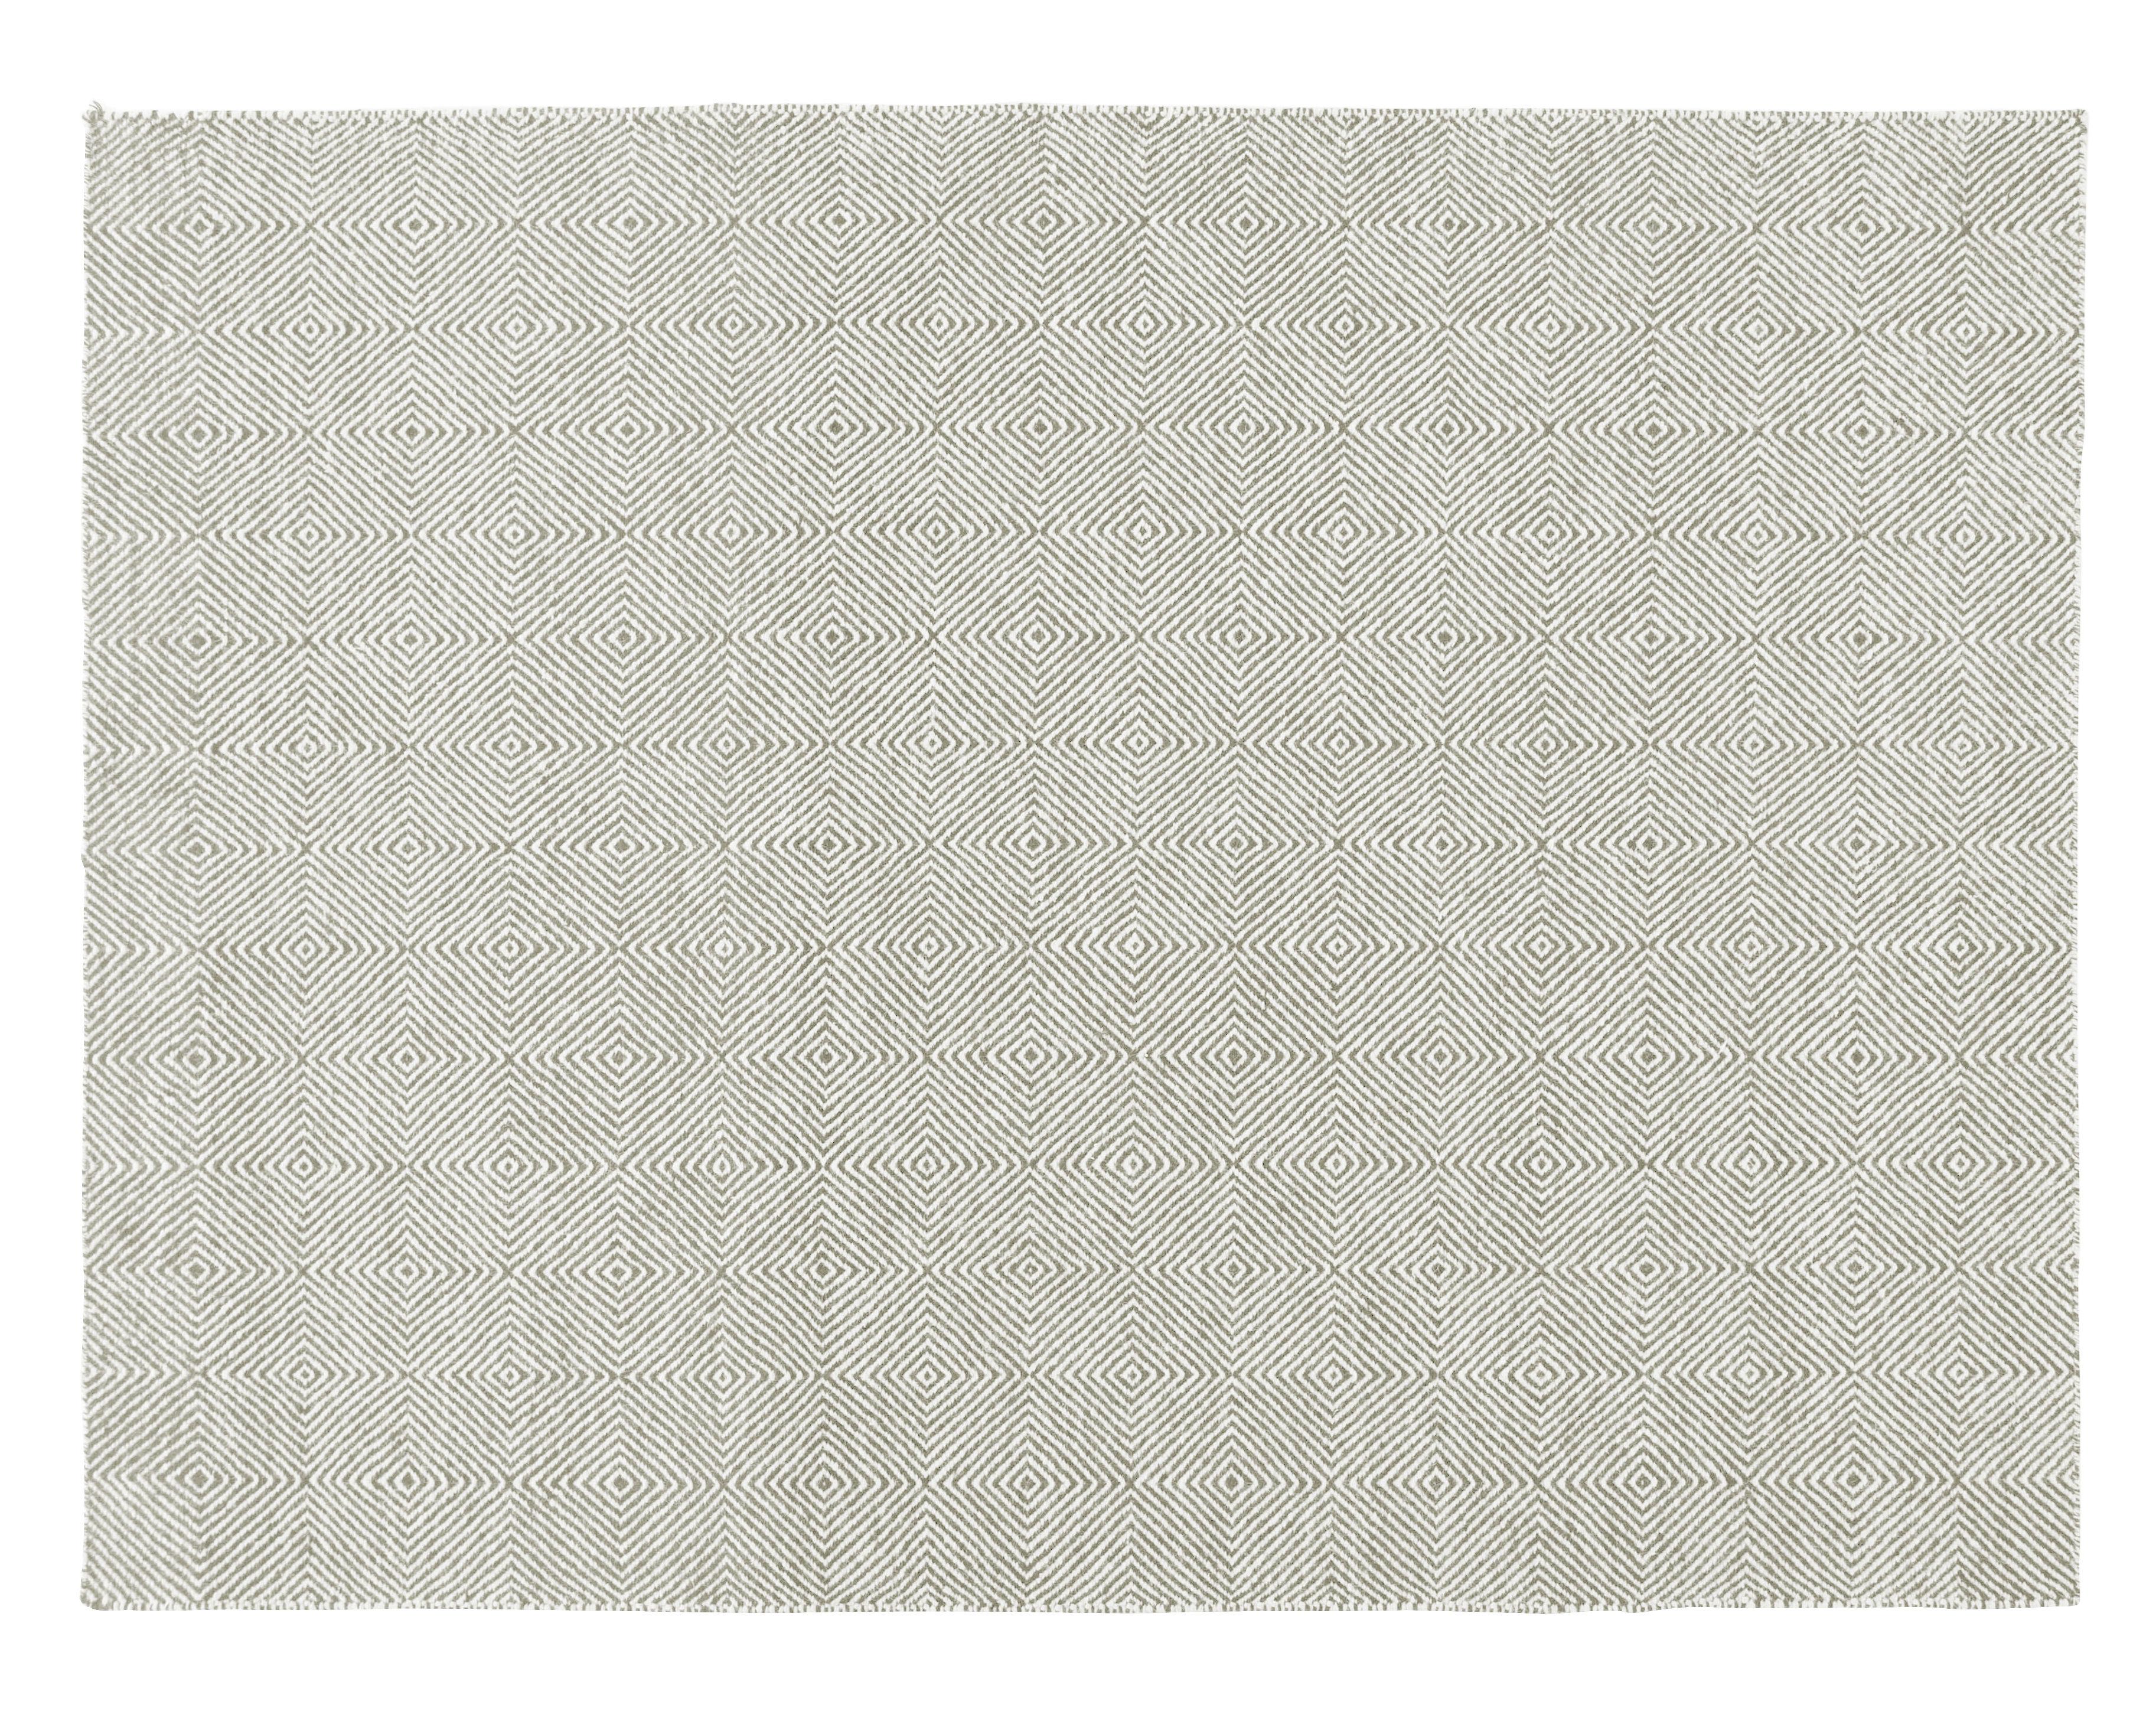 Déco - Tapis - Tapis Sail / 200 x 150 cm - Gan - Taupe - Laine vierge